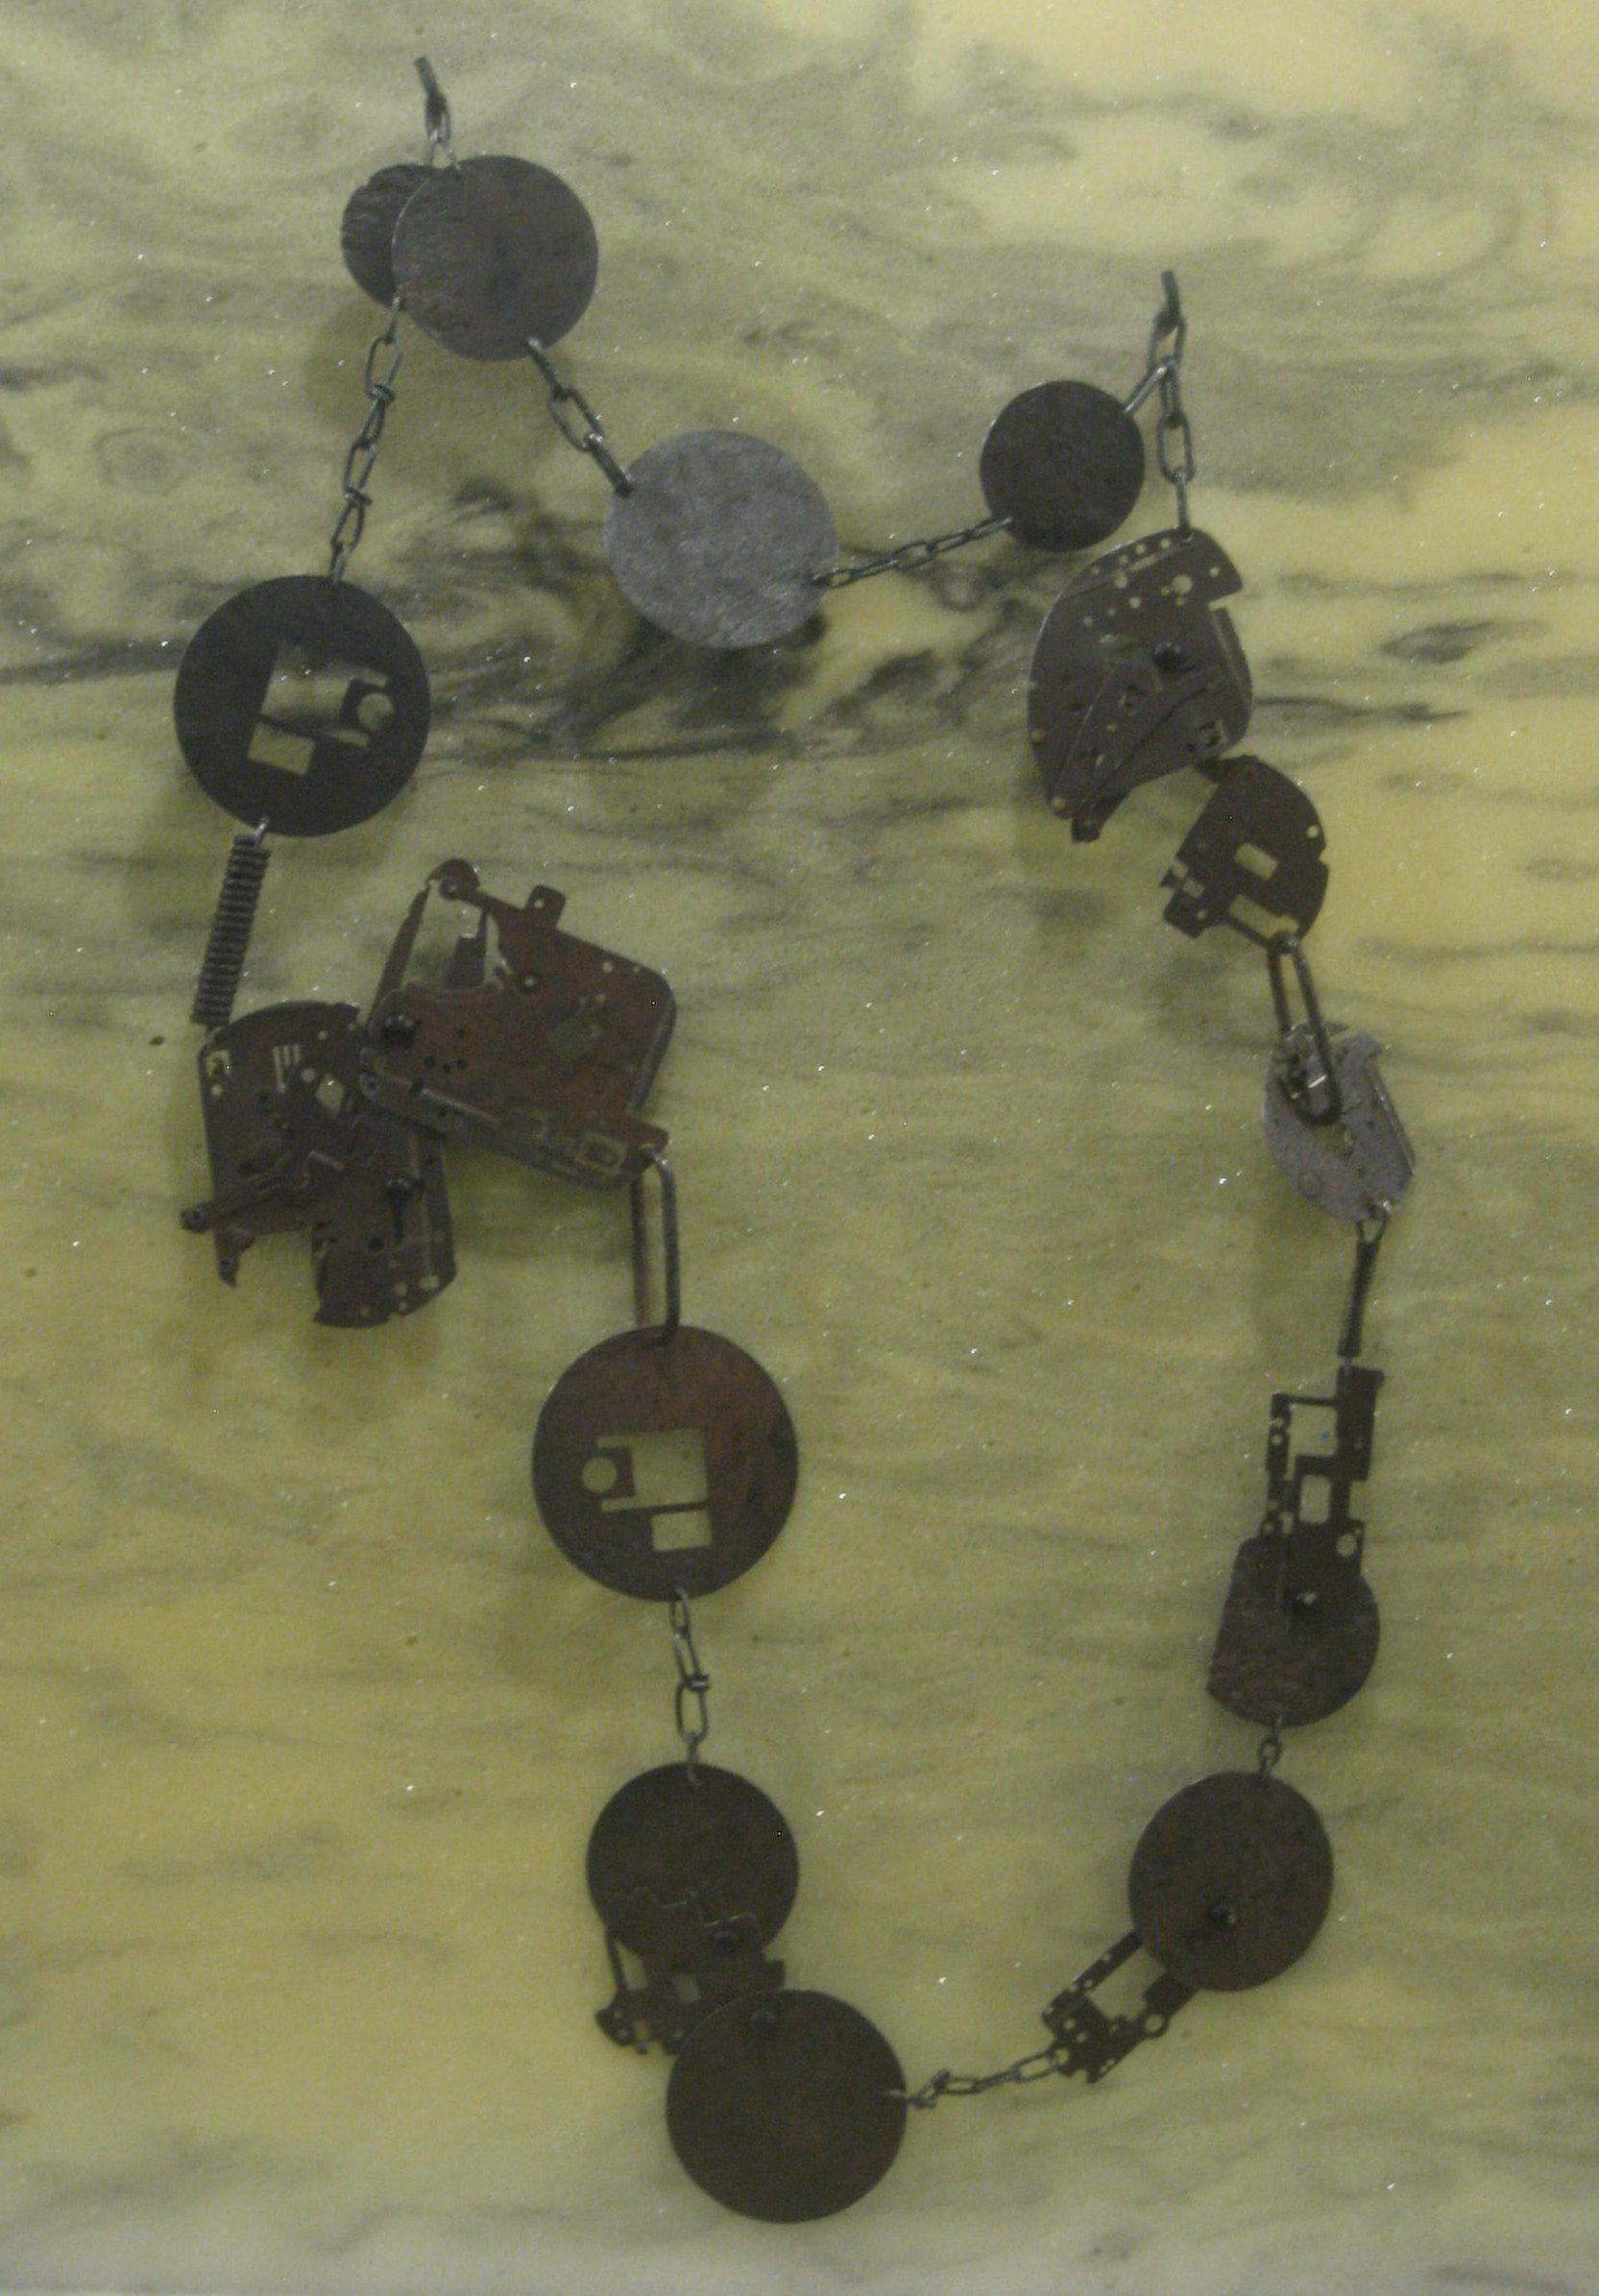 Marianne Anselin, Mécanique, halssieraad, 2007. Collectie S. Thierry-de Saint Rapt, metaal, tentoonstelling